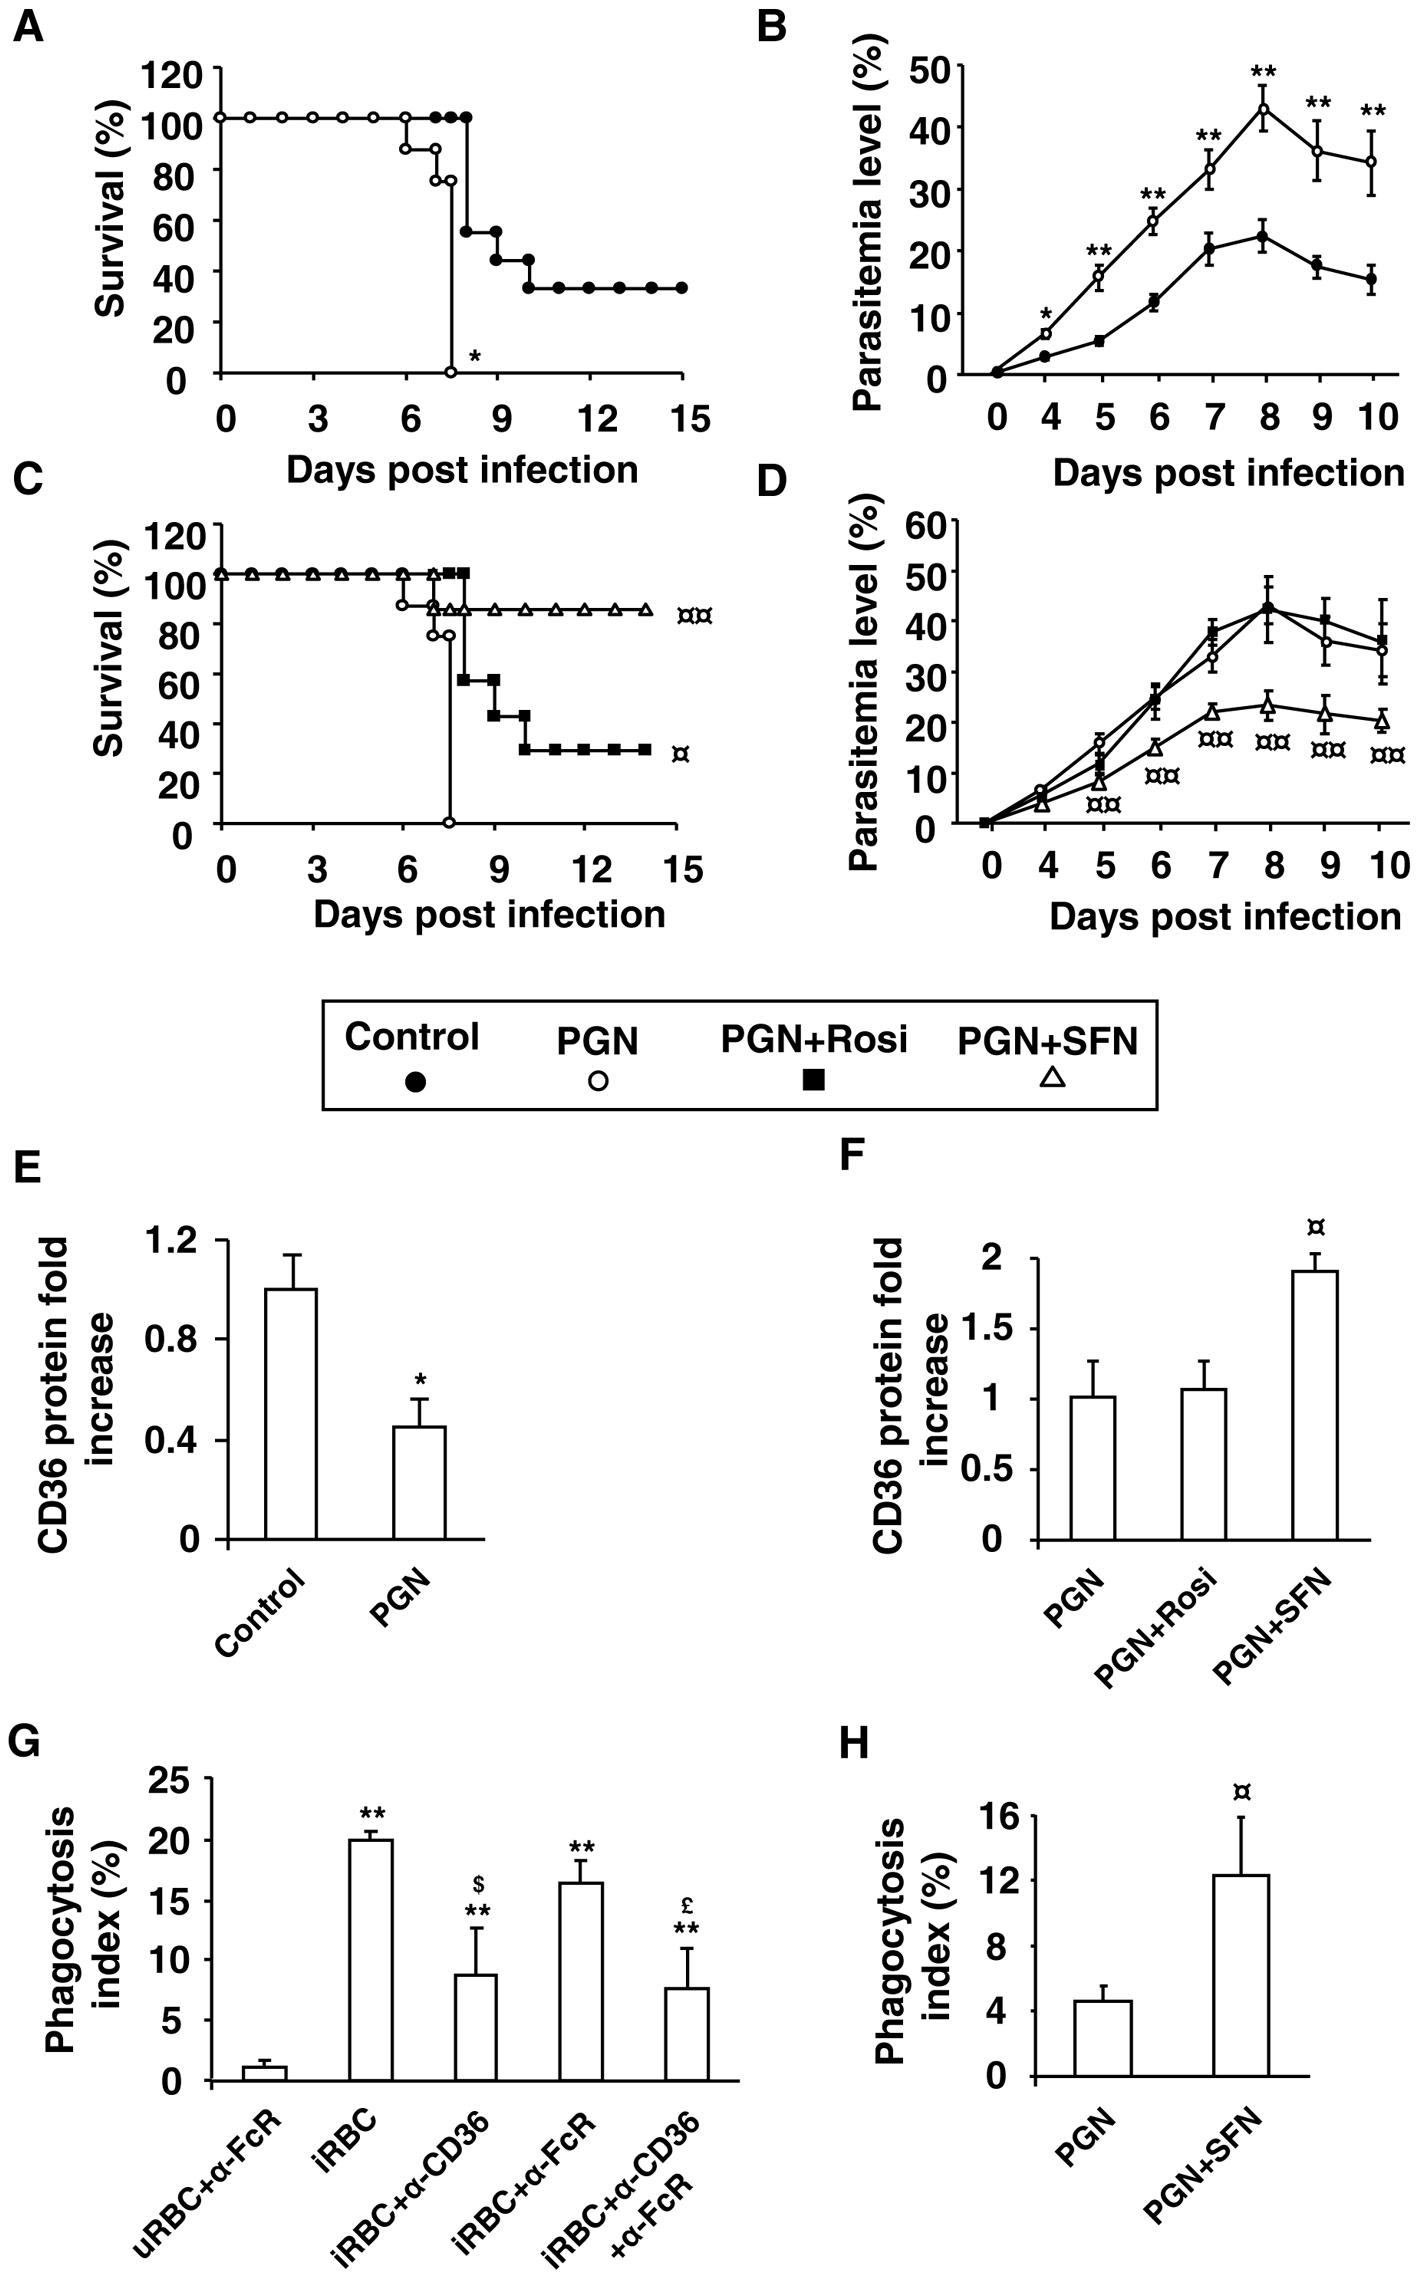 Nrf2 activator sulforaphane improves the outcome of induced-severe malaria trough a reduction in parasite burden.